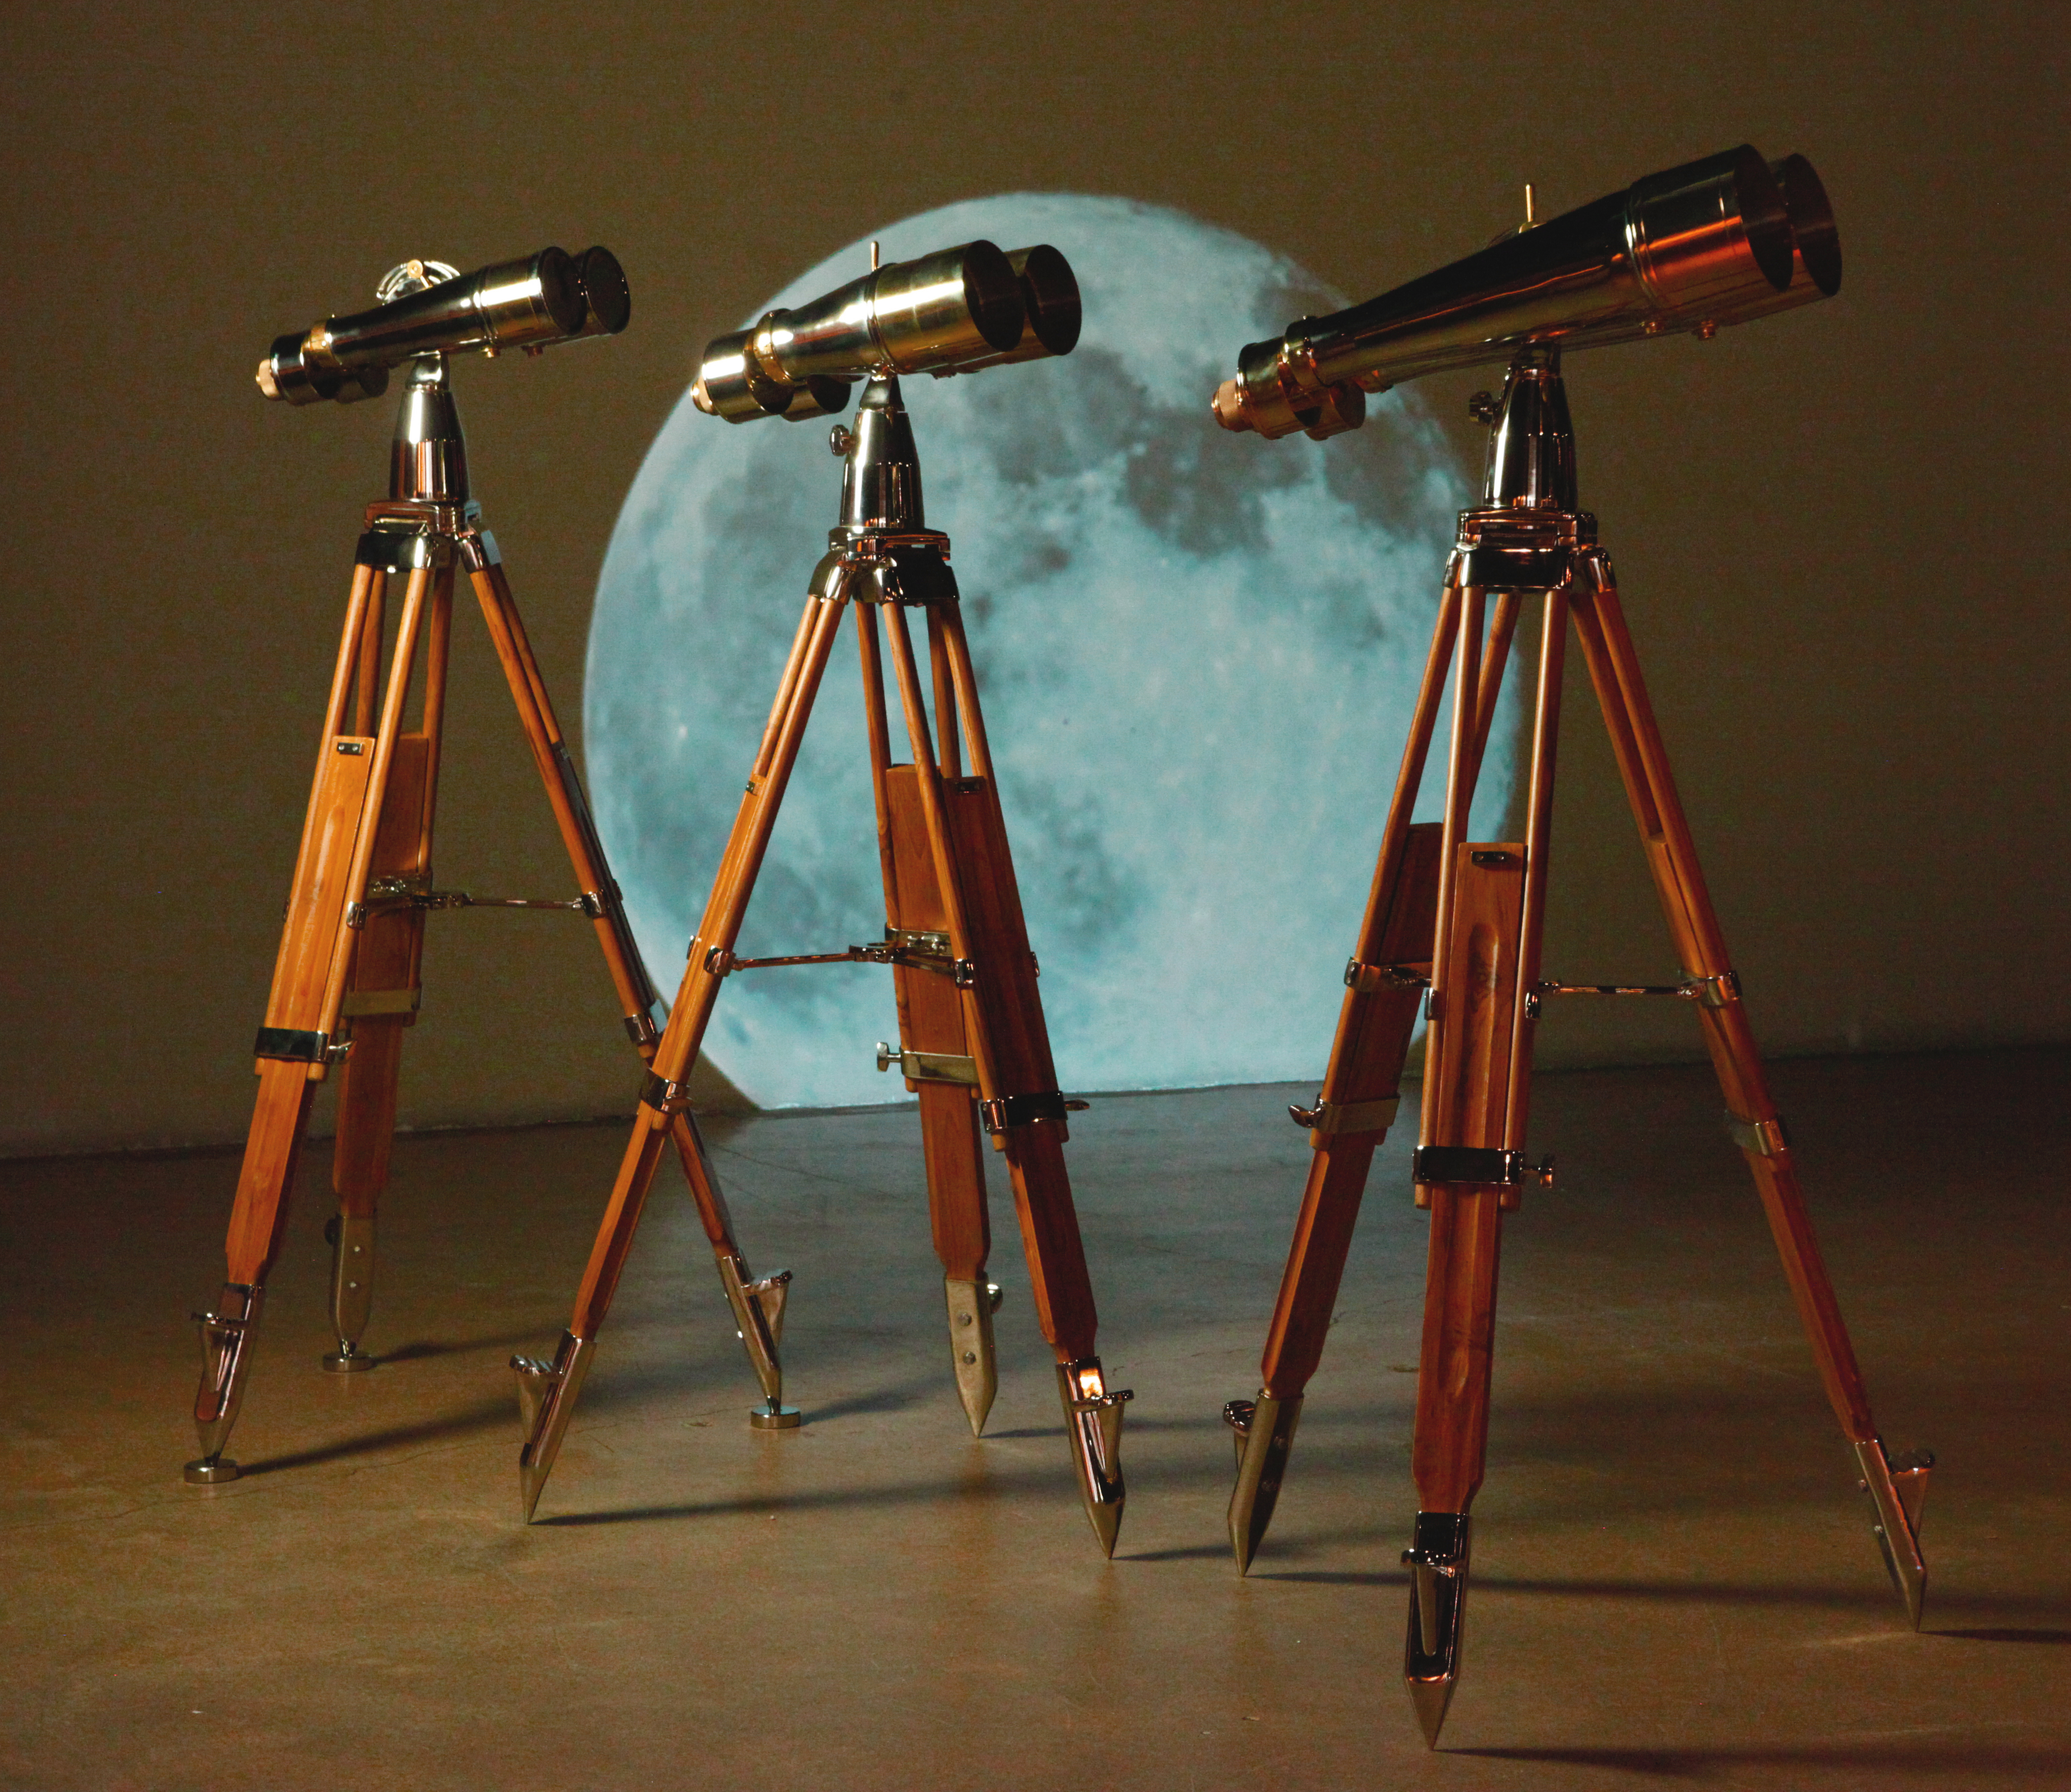 group image- 15x80, 15x100, 20x120 bigeye binoculars